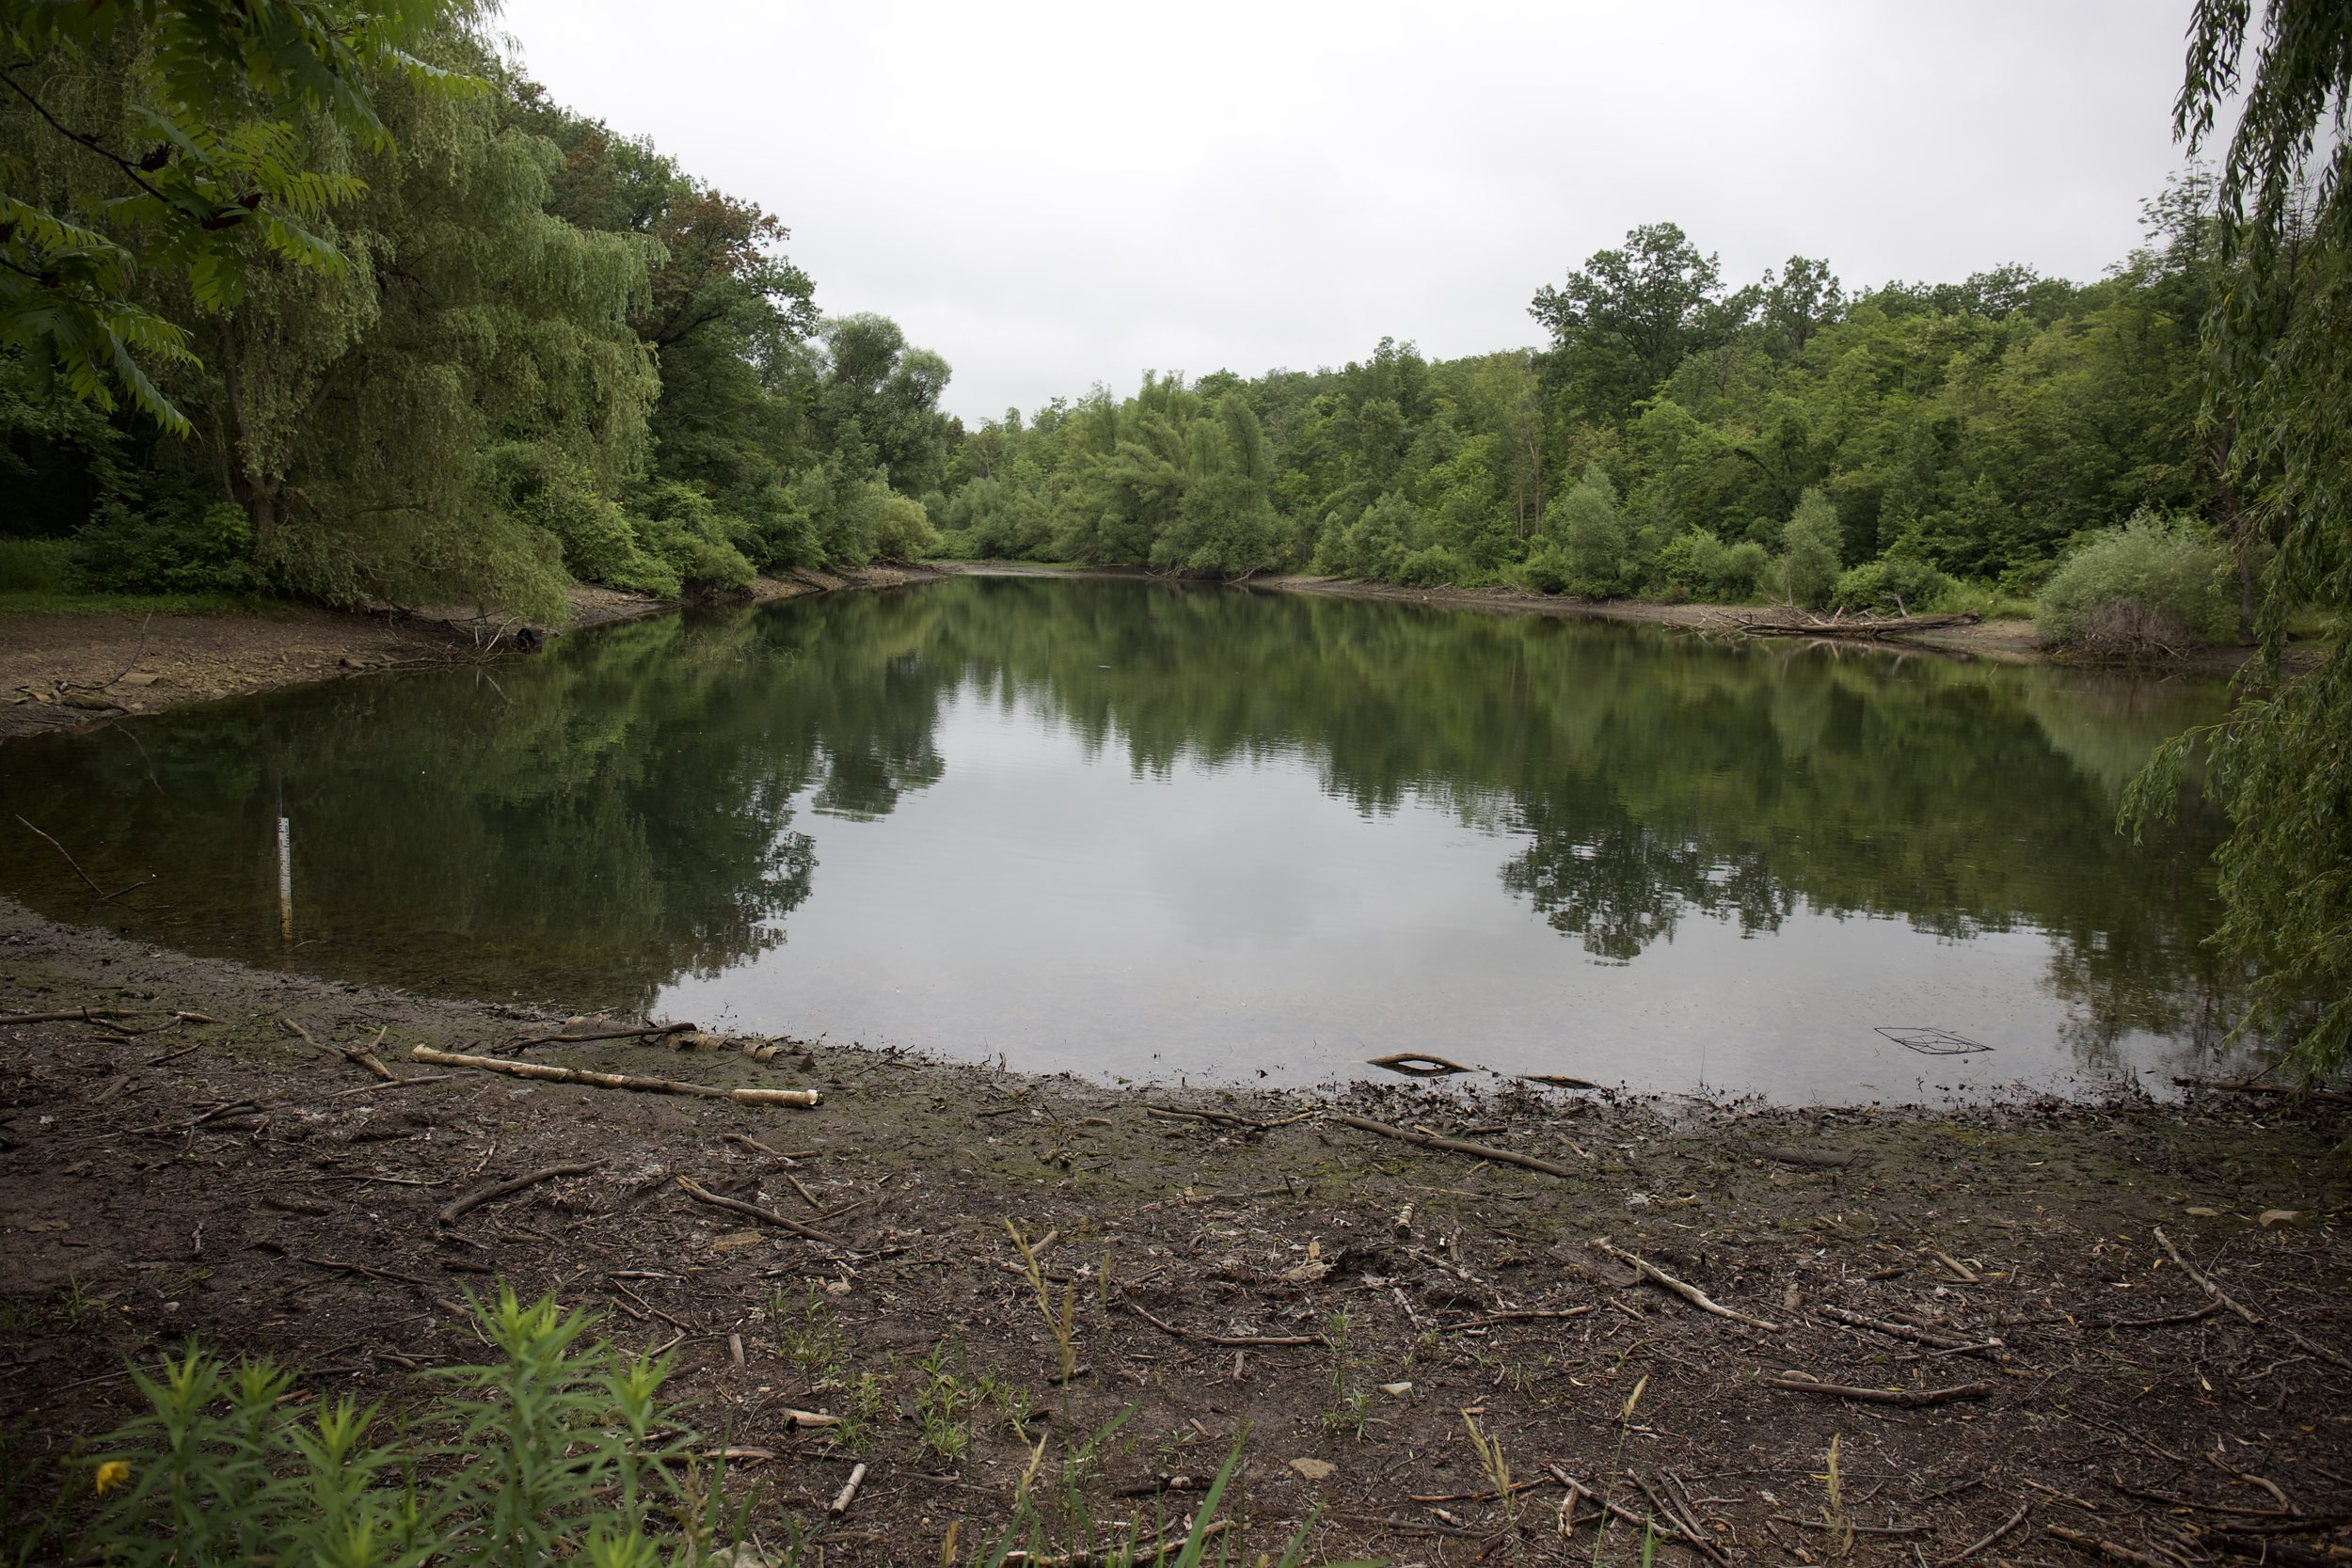 Drawdown of Muskrat Pond into Second Creek